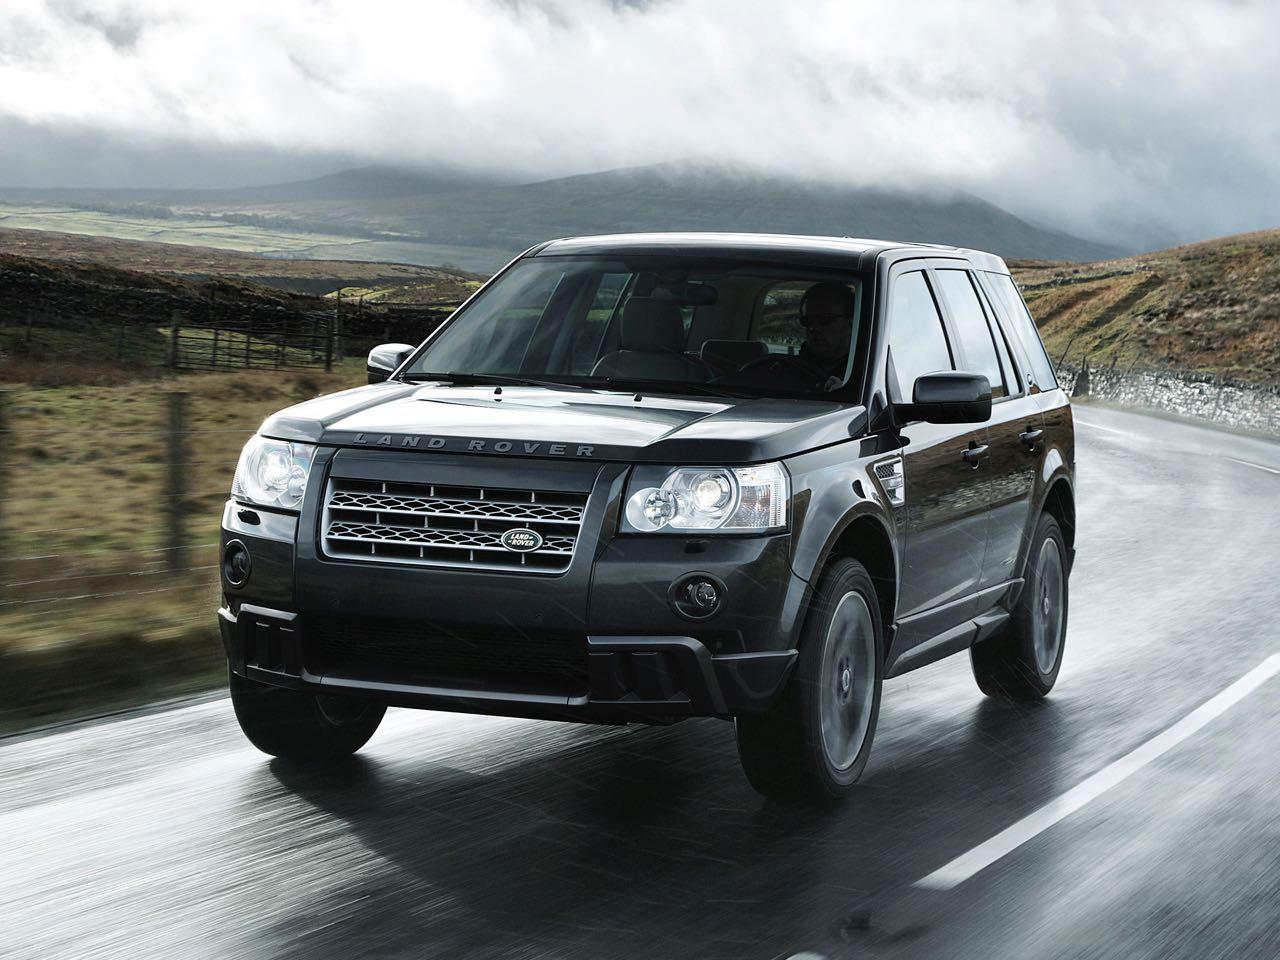 Land Rover Freelander 2010 – 3